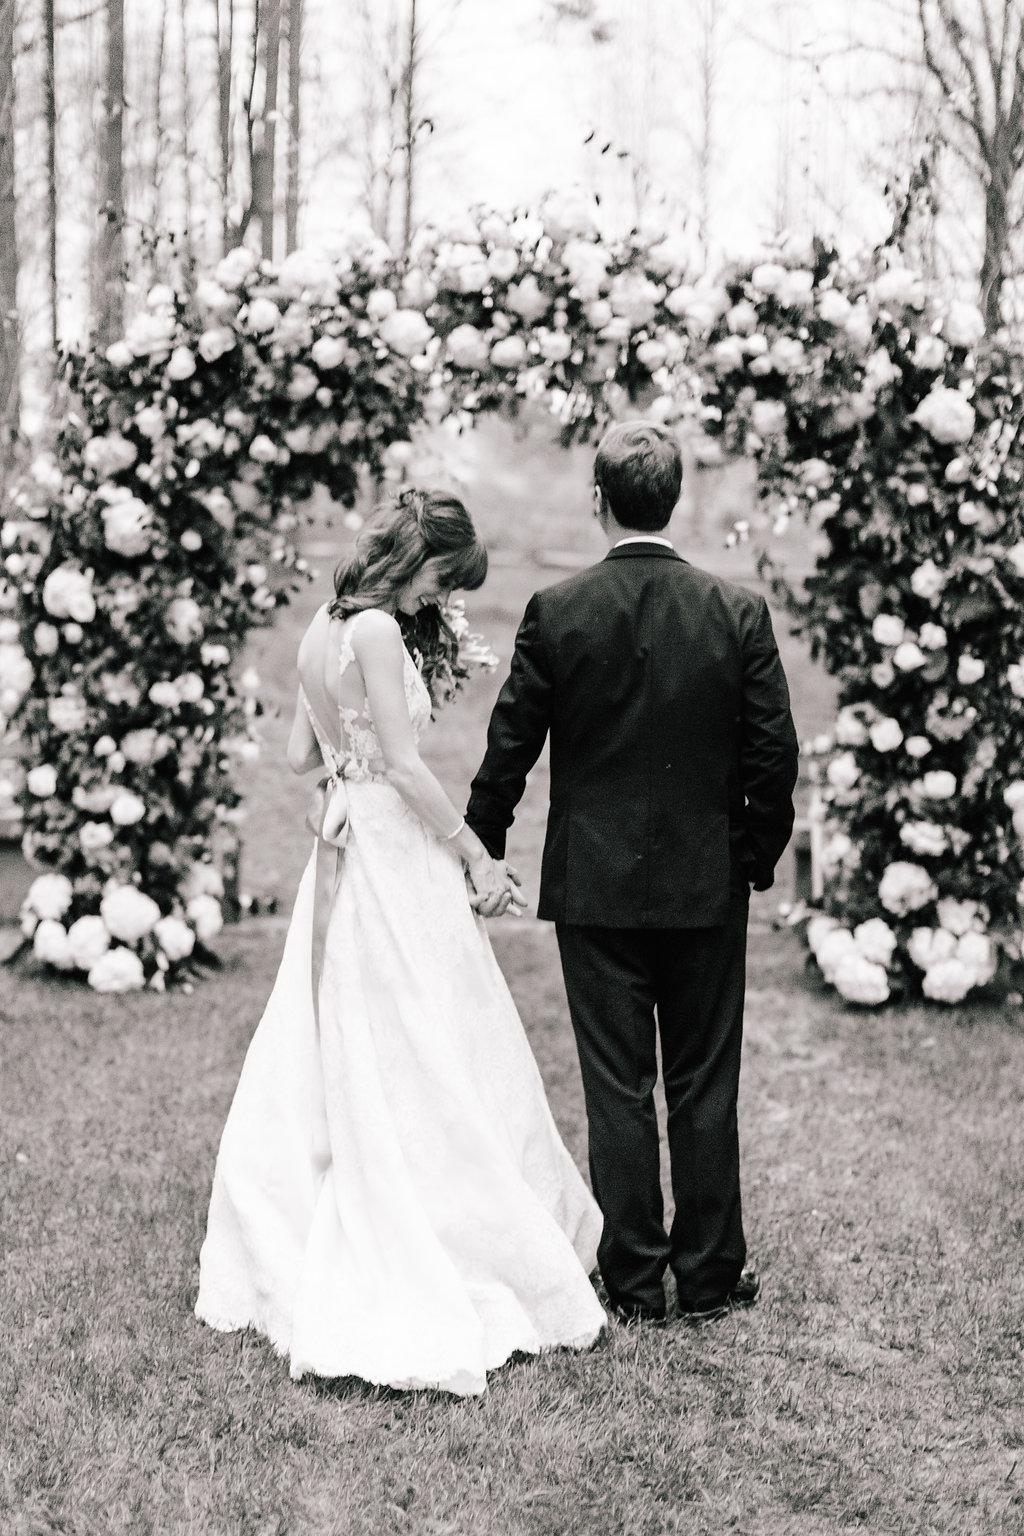 Wedding ceremony photography inspiration